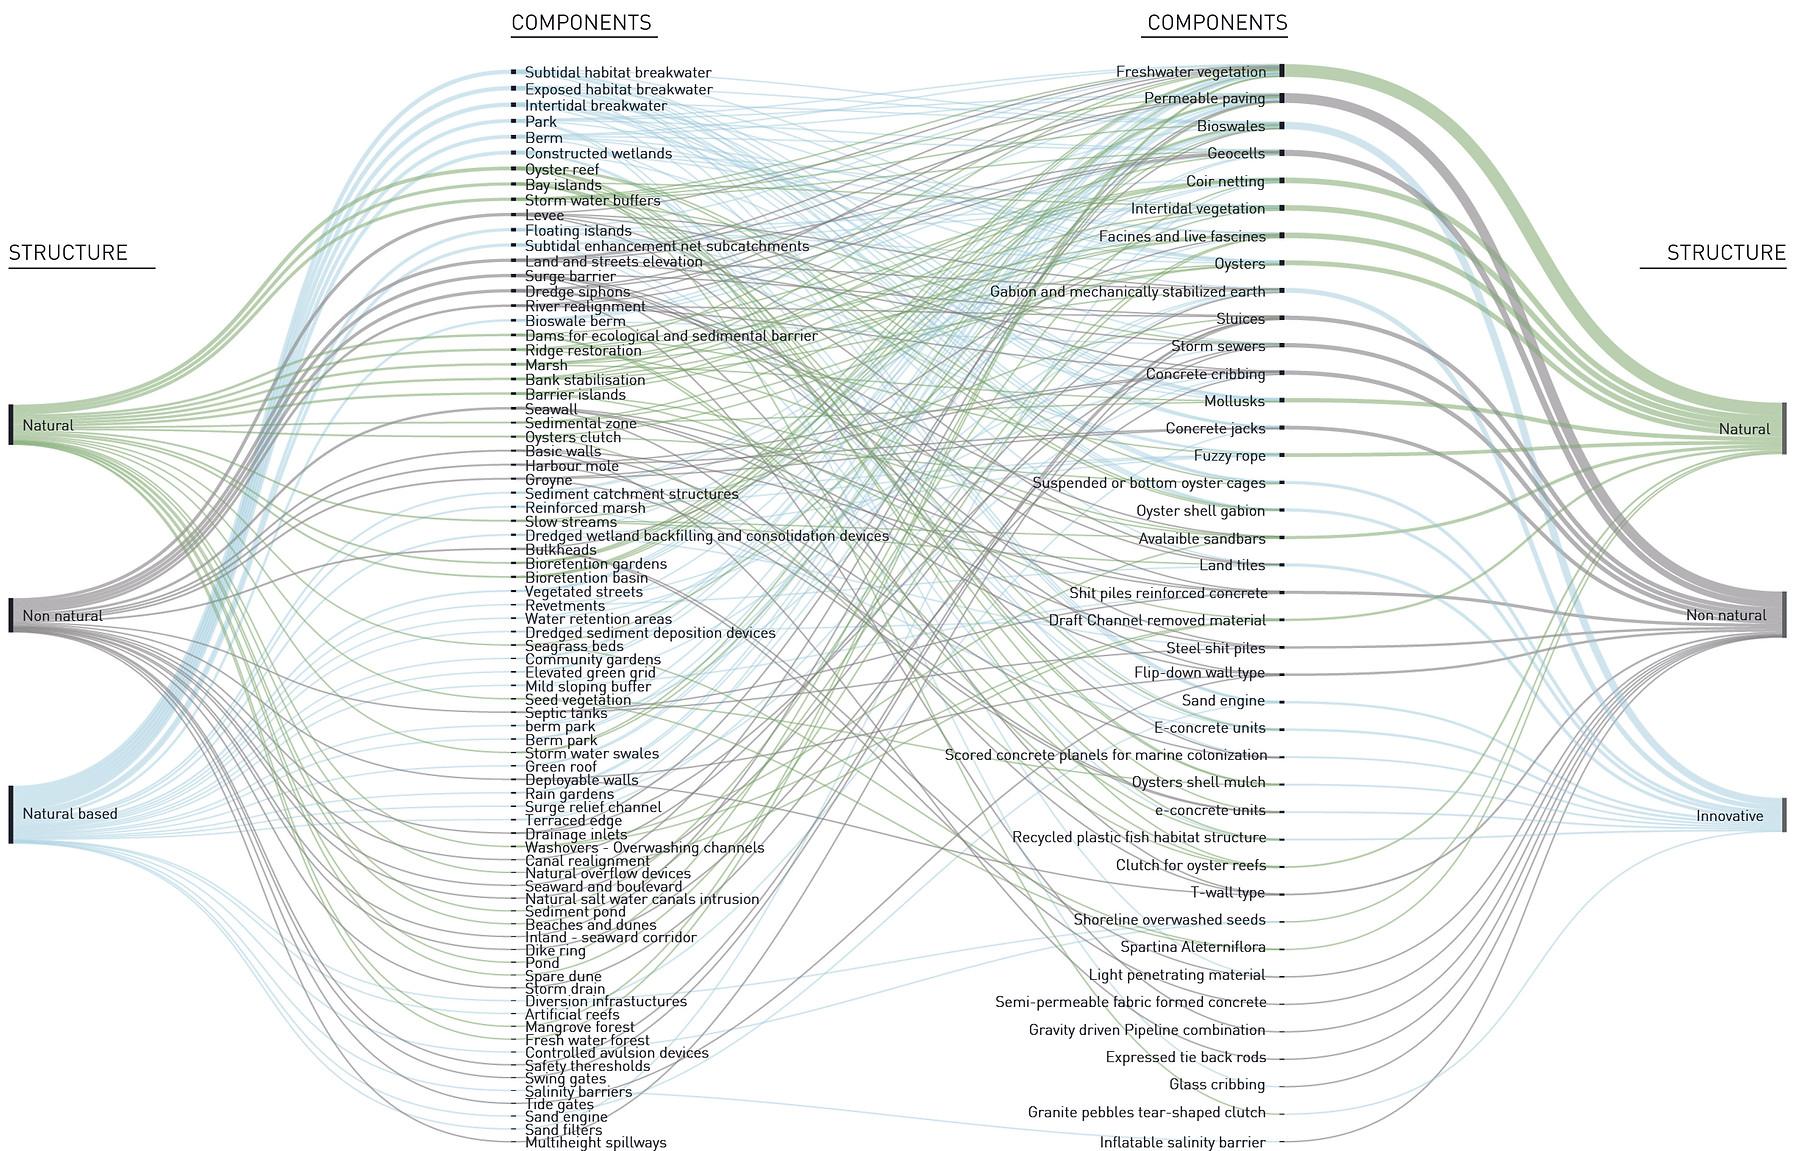 structure diagram-01.jpg